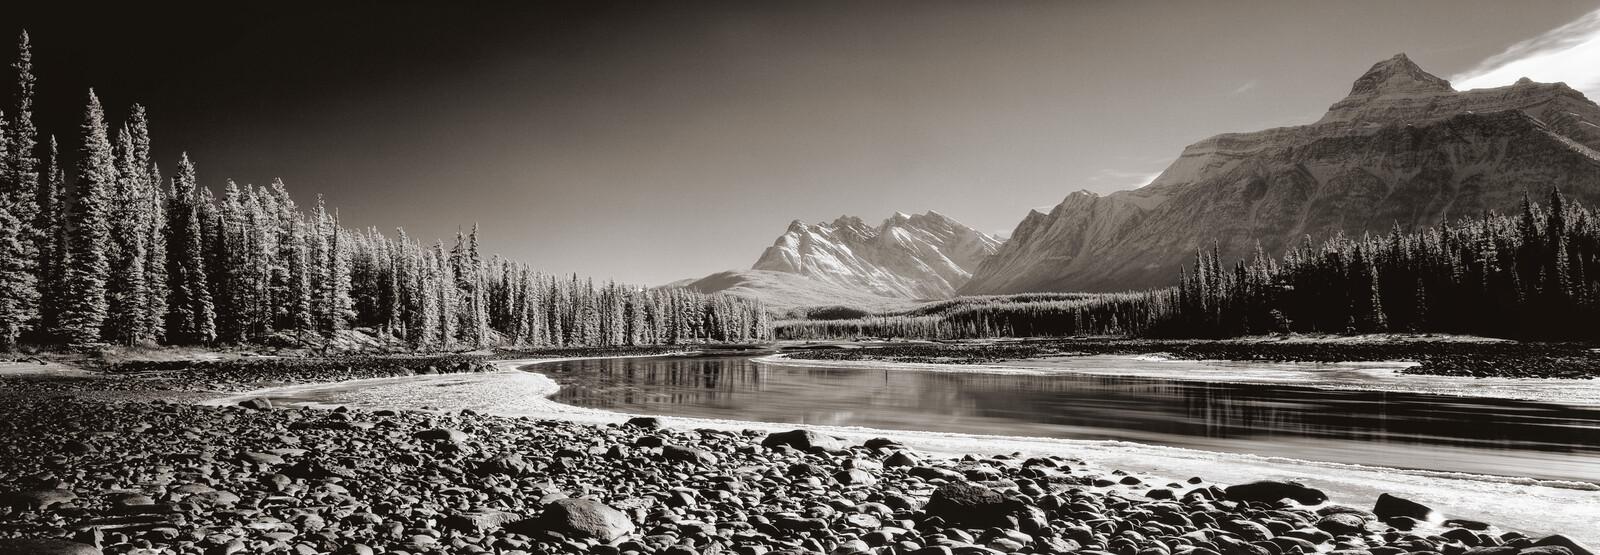 Athabasca River, Alberta, Canada - Helmut Hirler